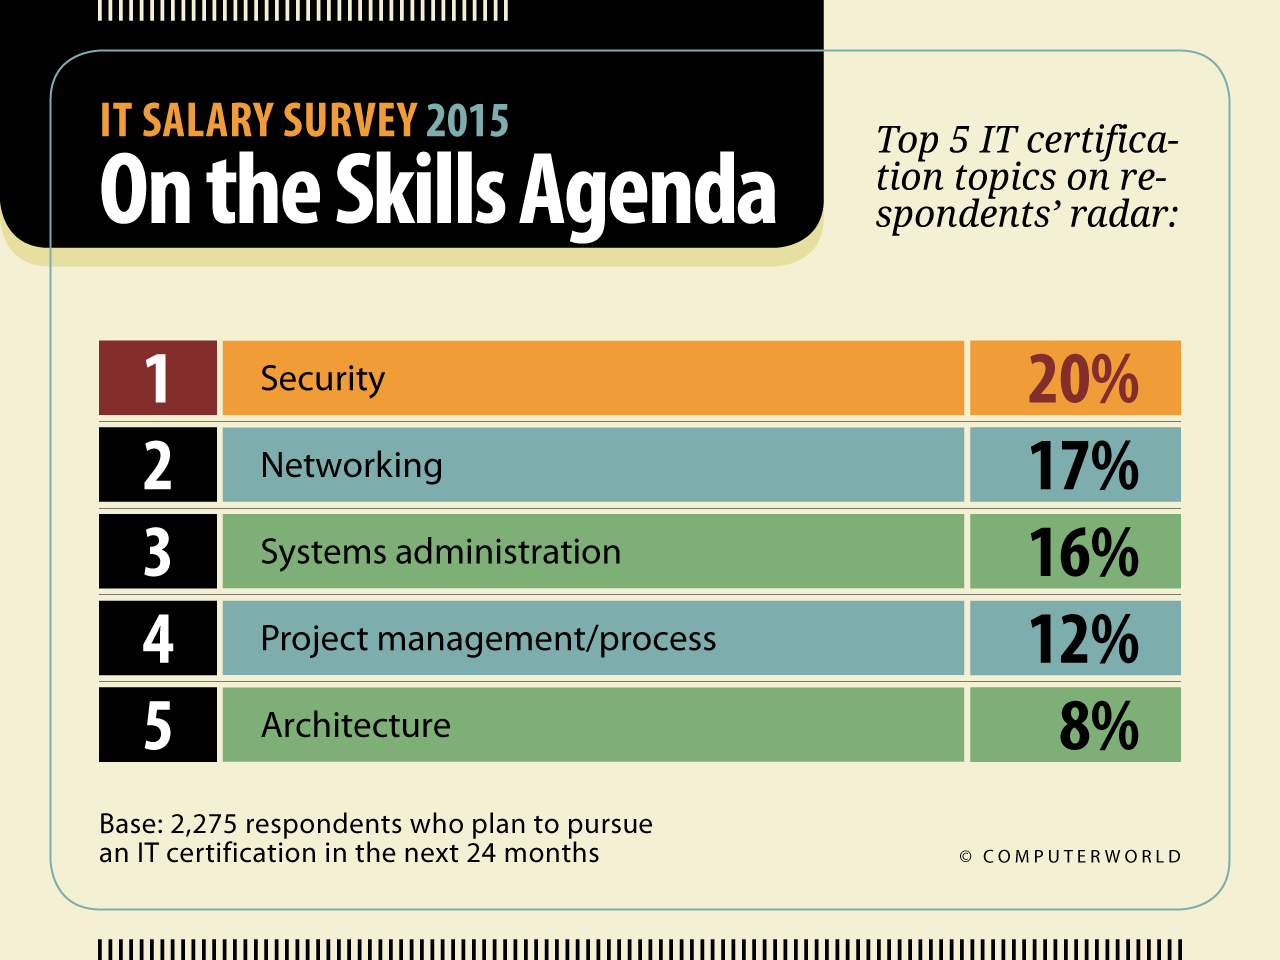 IT Salary Survey 2015: Highlights | Computerworld